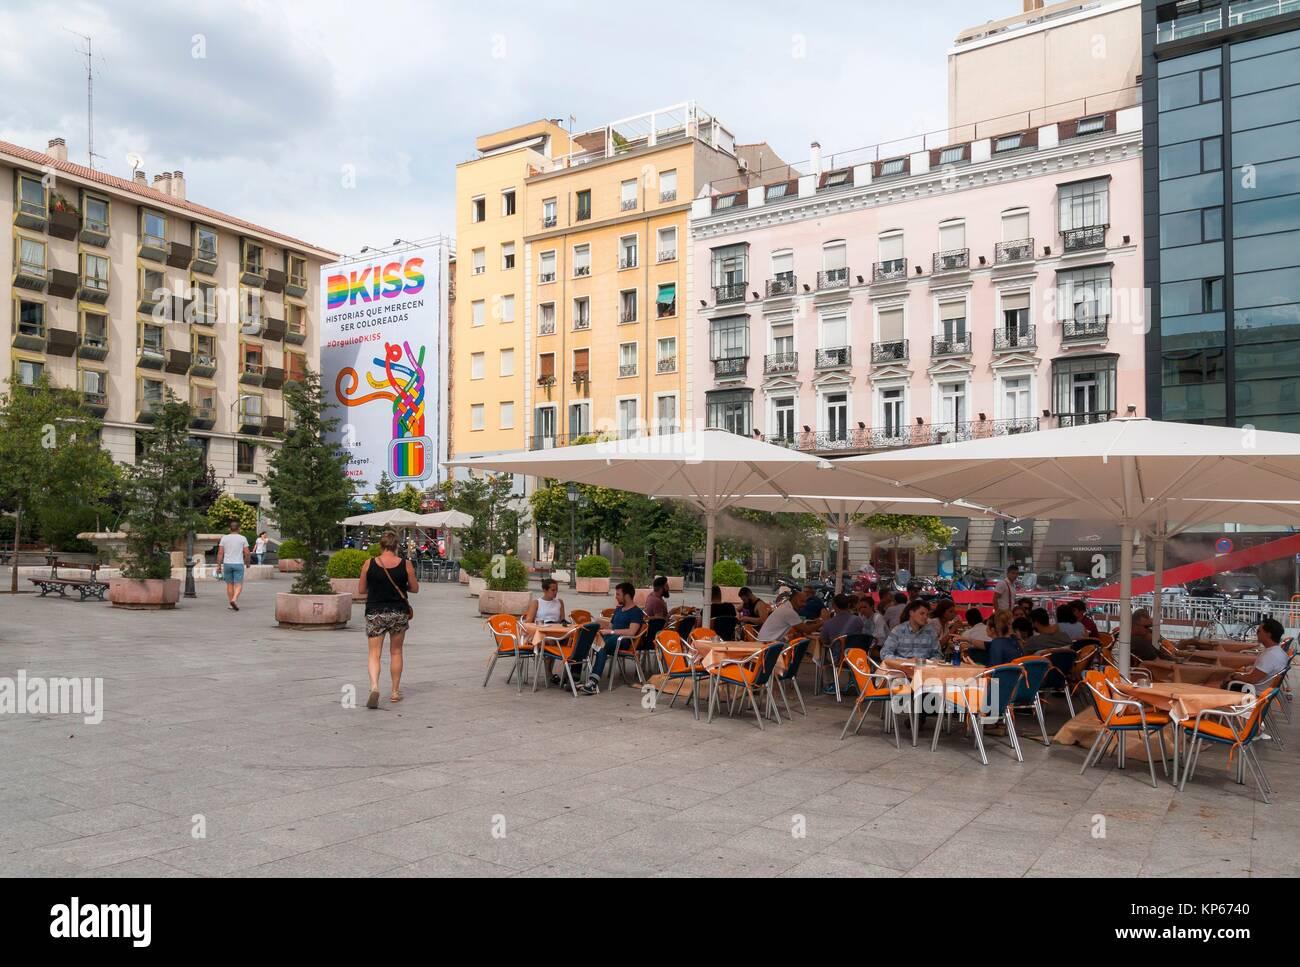 Plaza Chueca Madrid Imágenes De Stock & Plaza Chueca Madrid Fotos De ...